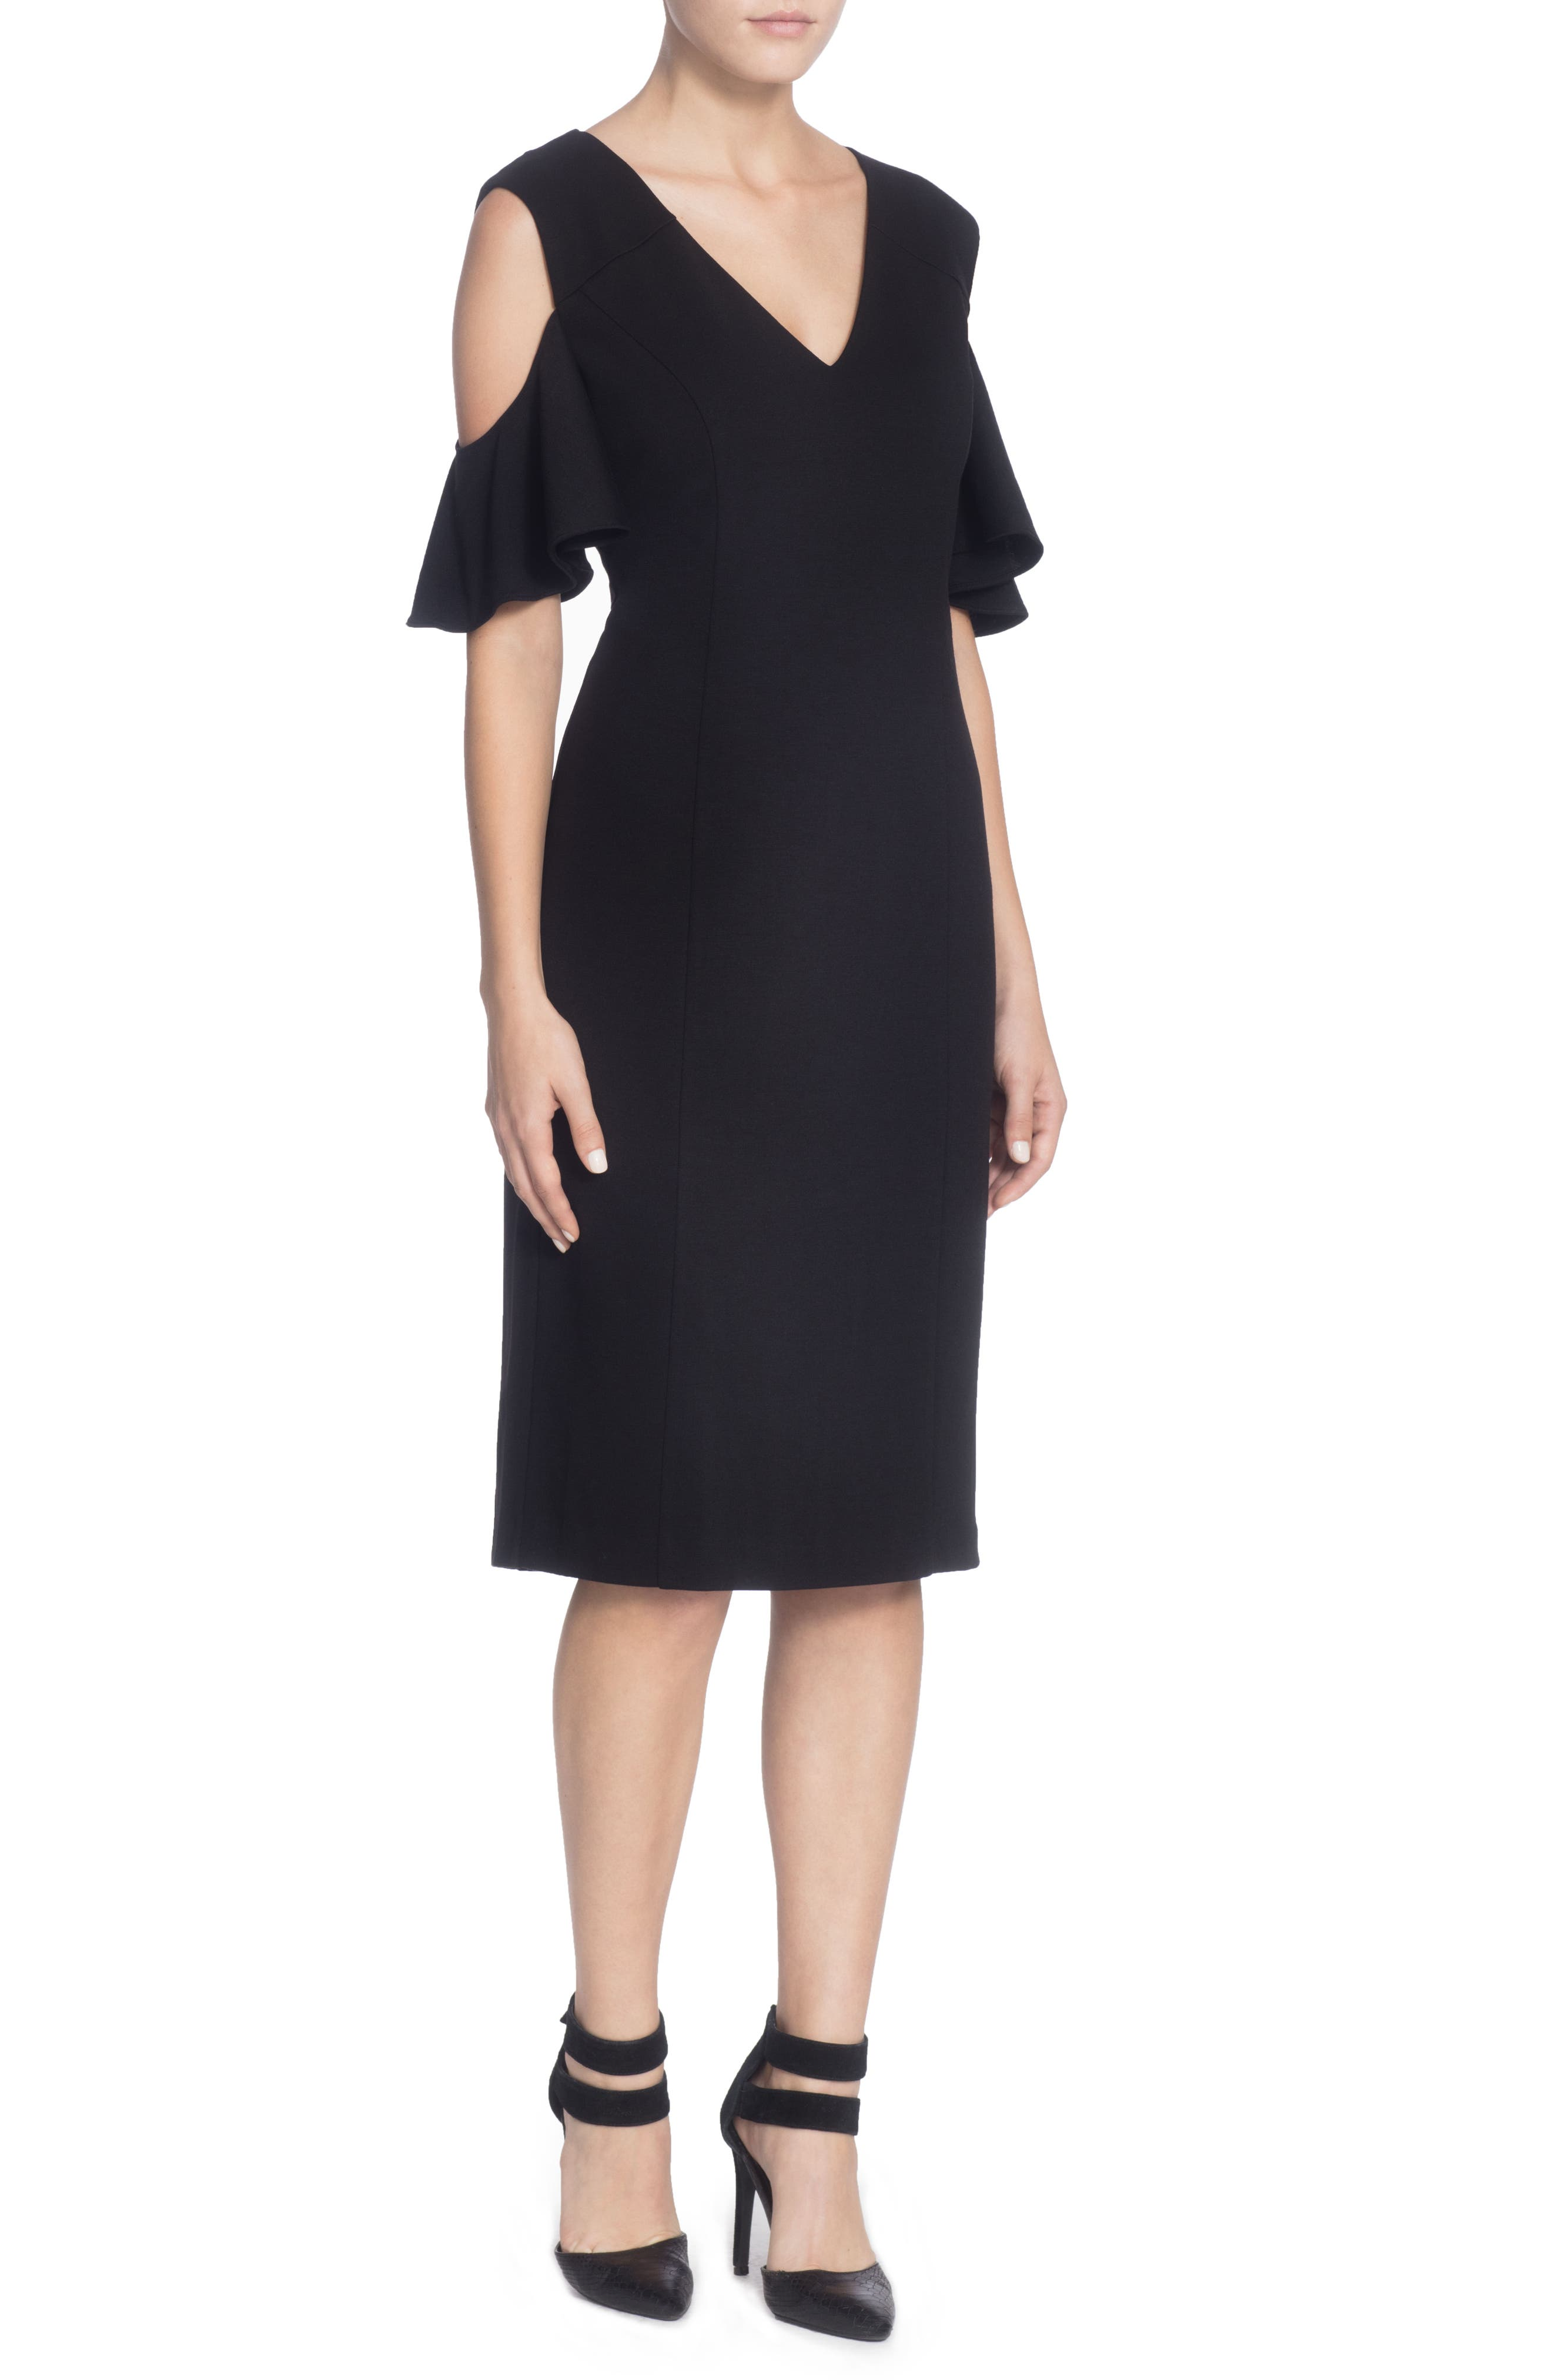 Liss Cold Shoulder Sheath Dress,                         Main,                         color, Black